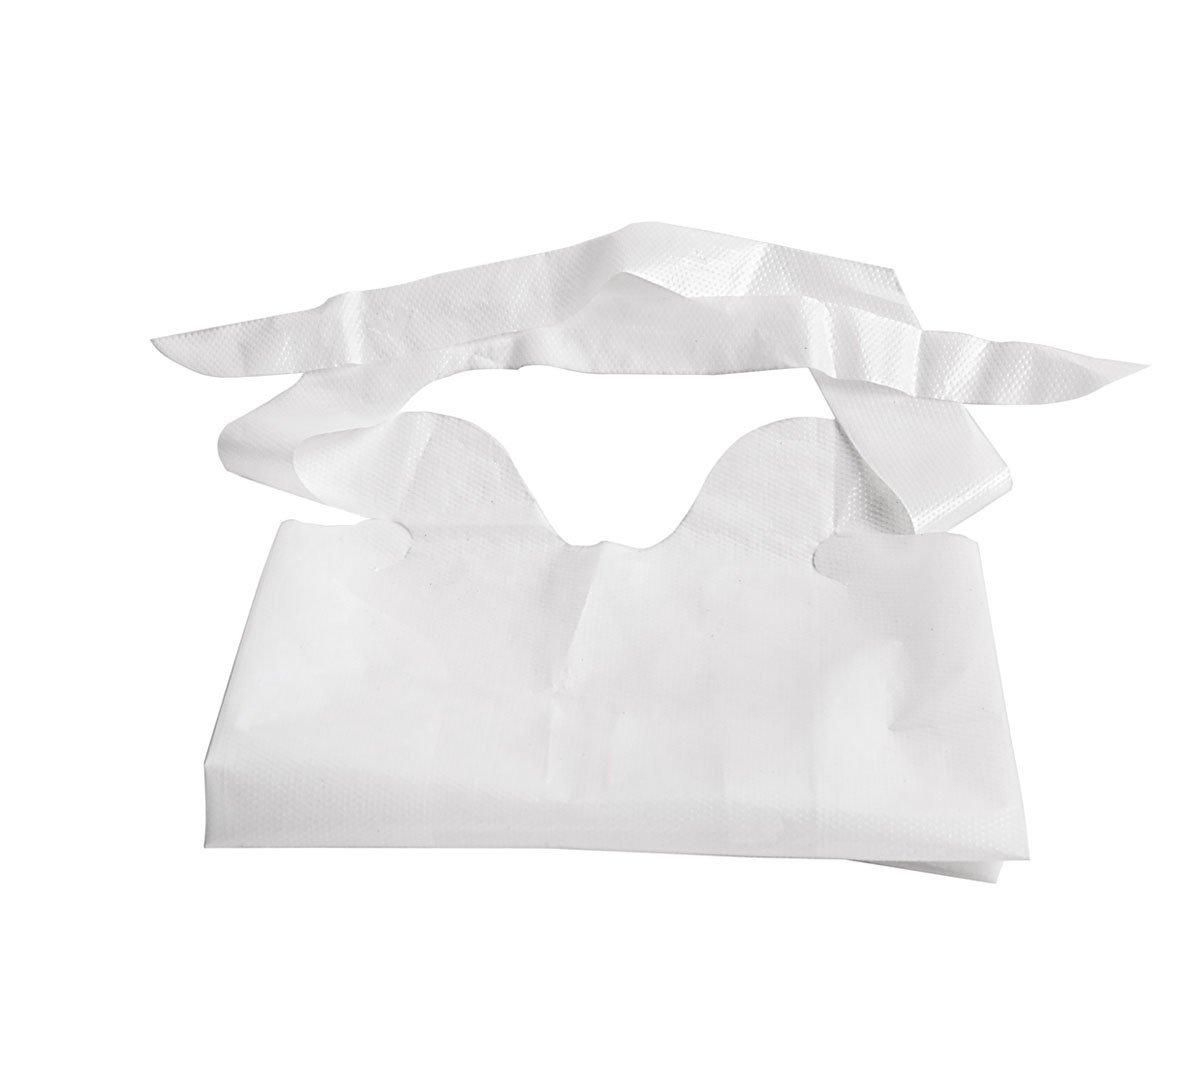 Medline NON24267A Waterproof Plastic Bibs, 15'' x 20'', White (Pack of 500)